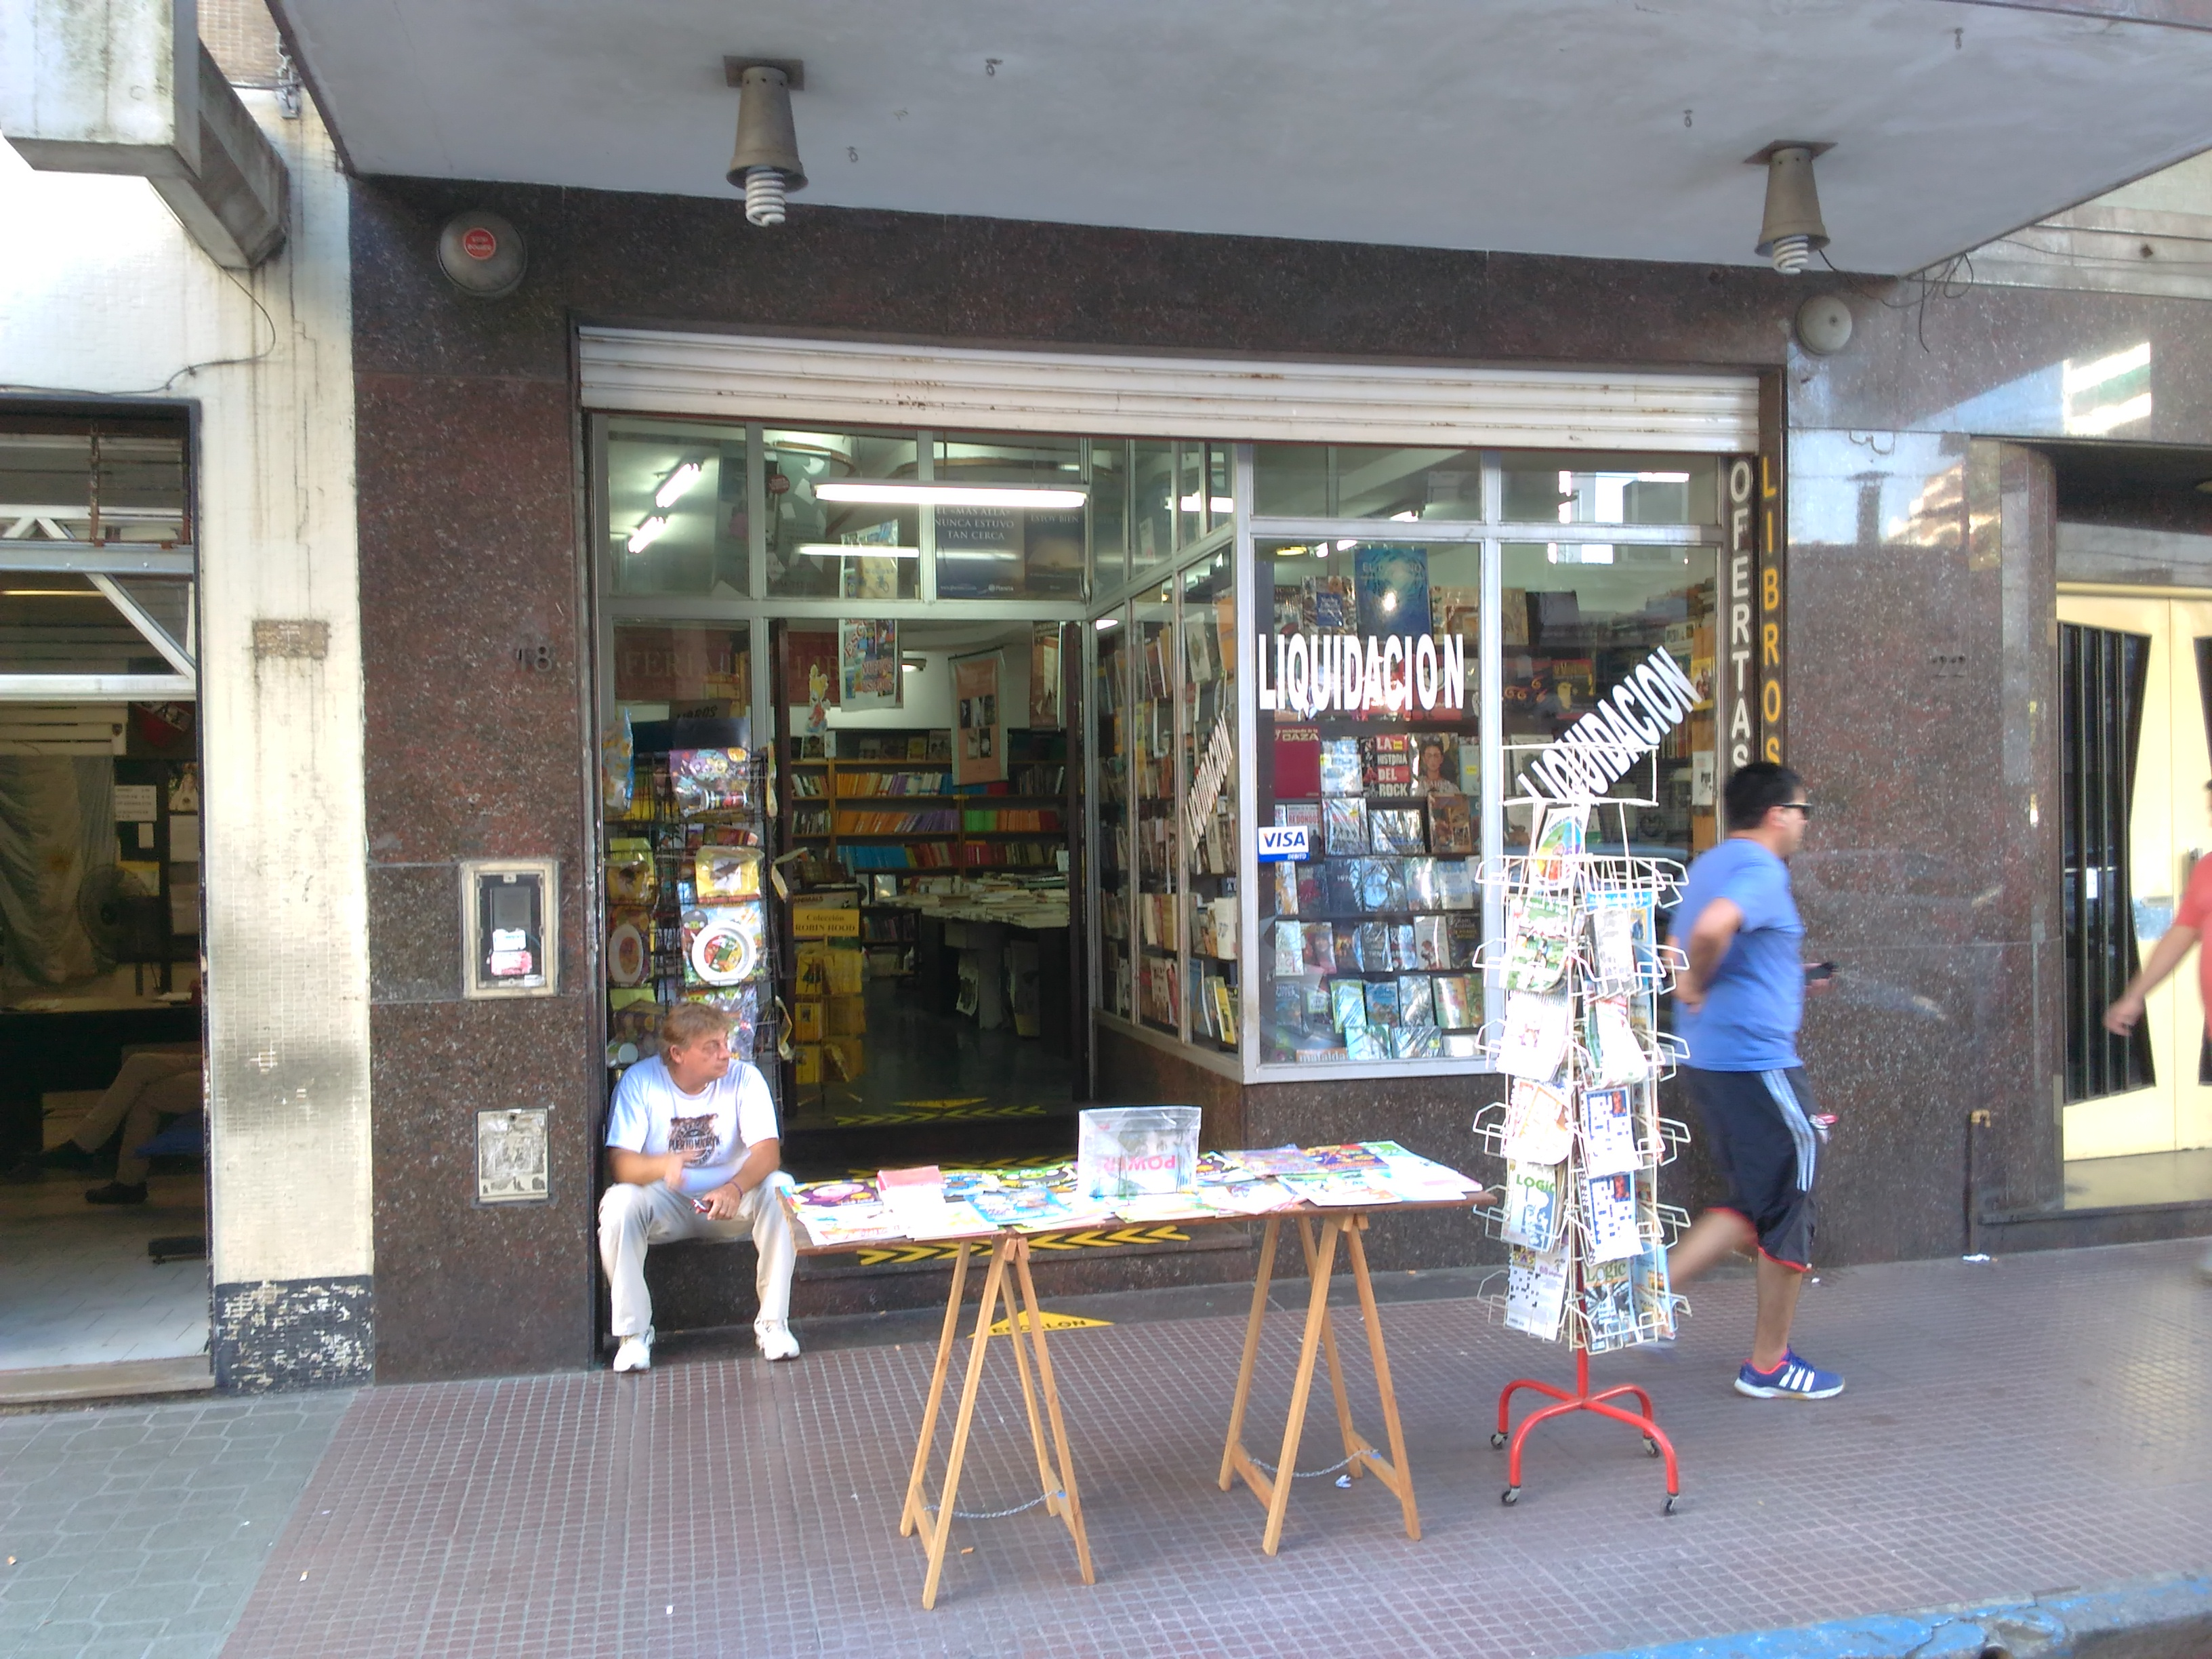 Feria del libro de Avellaneda - Feria del Libro de Avellaneda